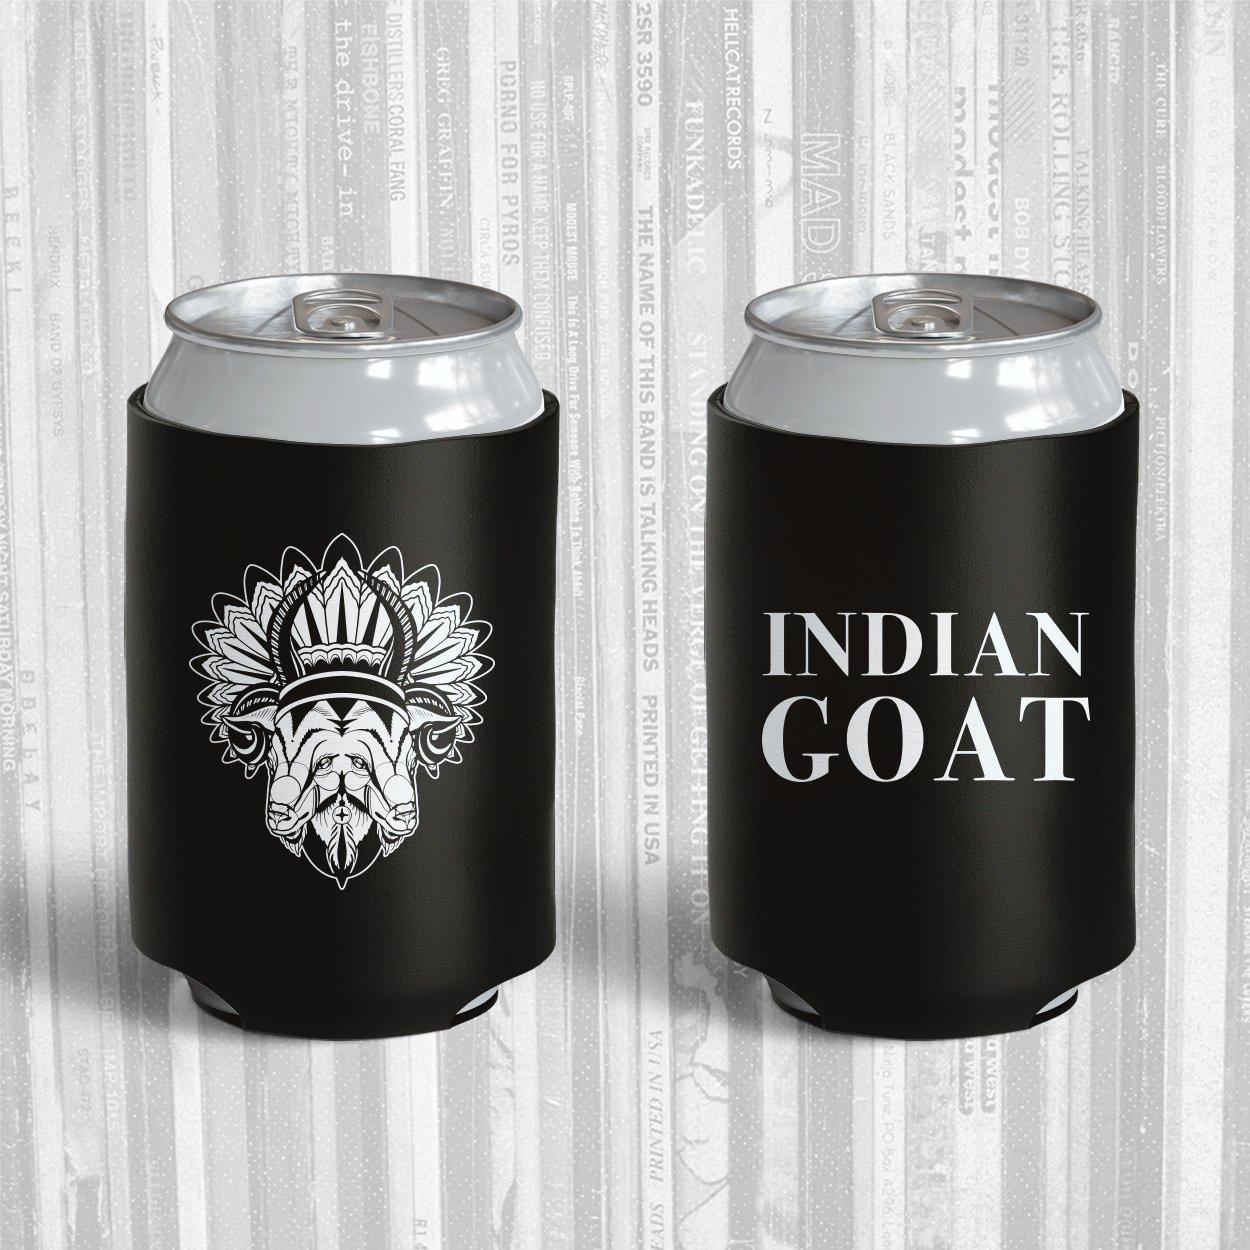 Indian Goat - Koozies